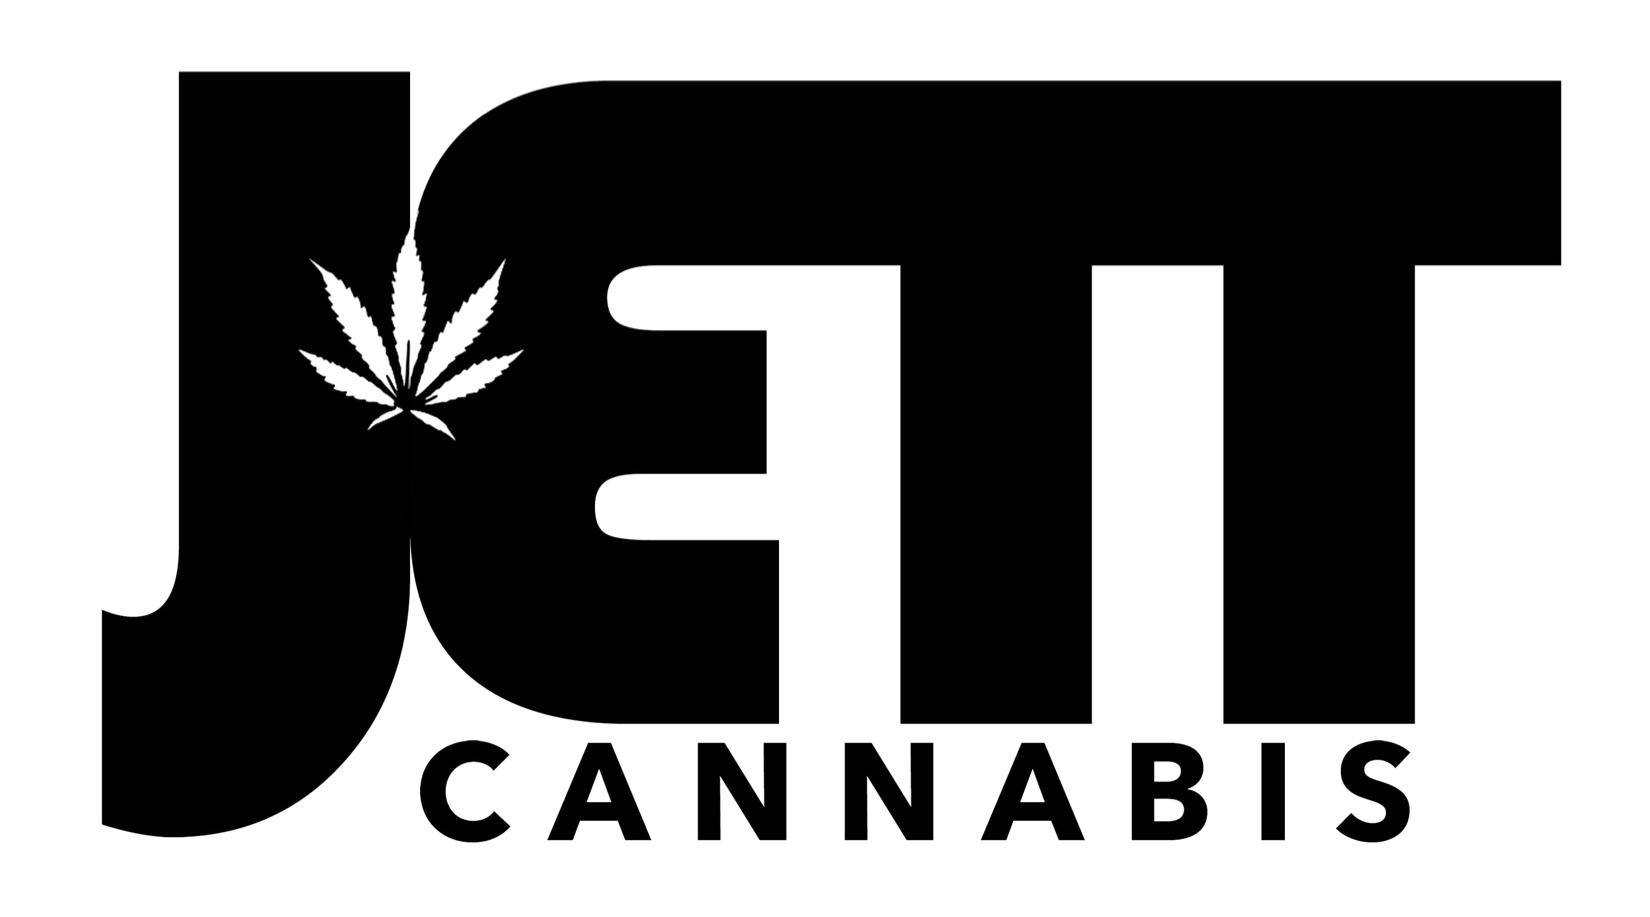 Jett Cannabis